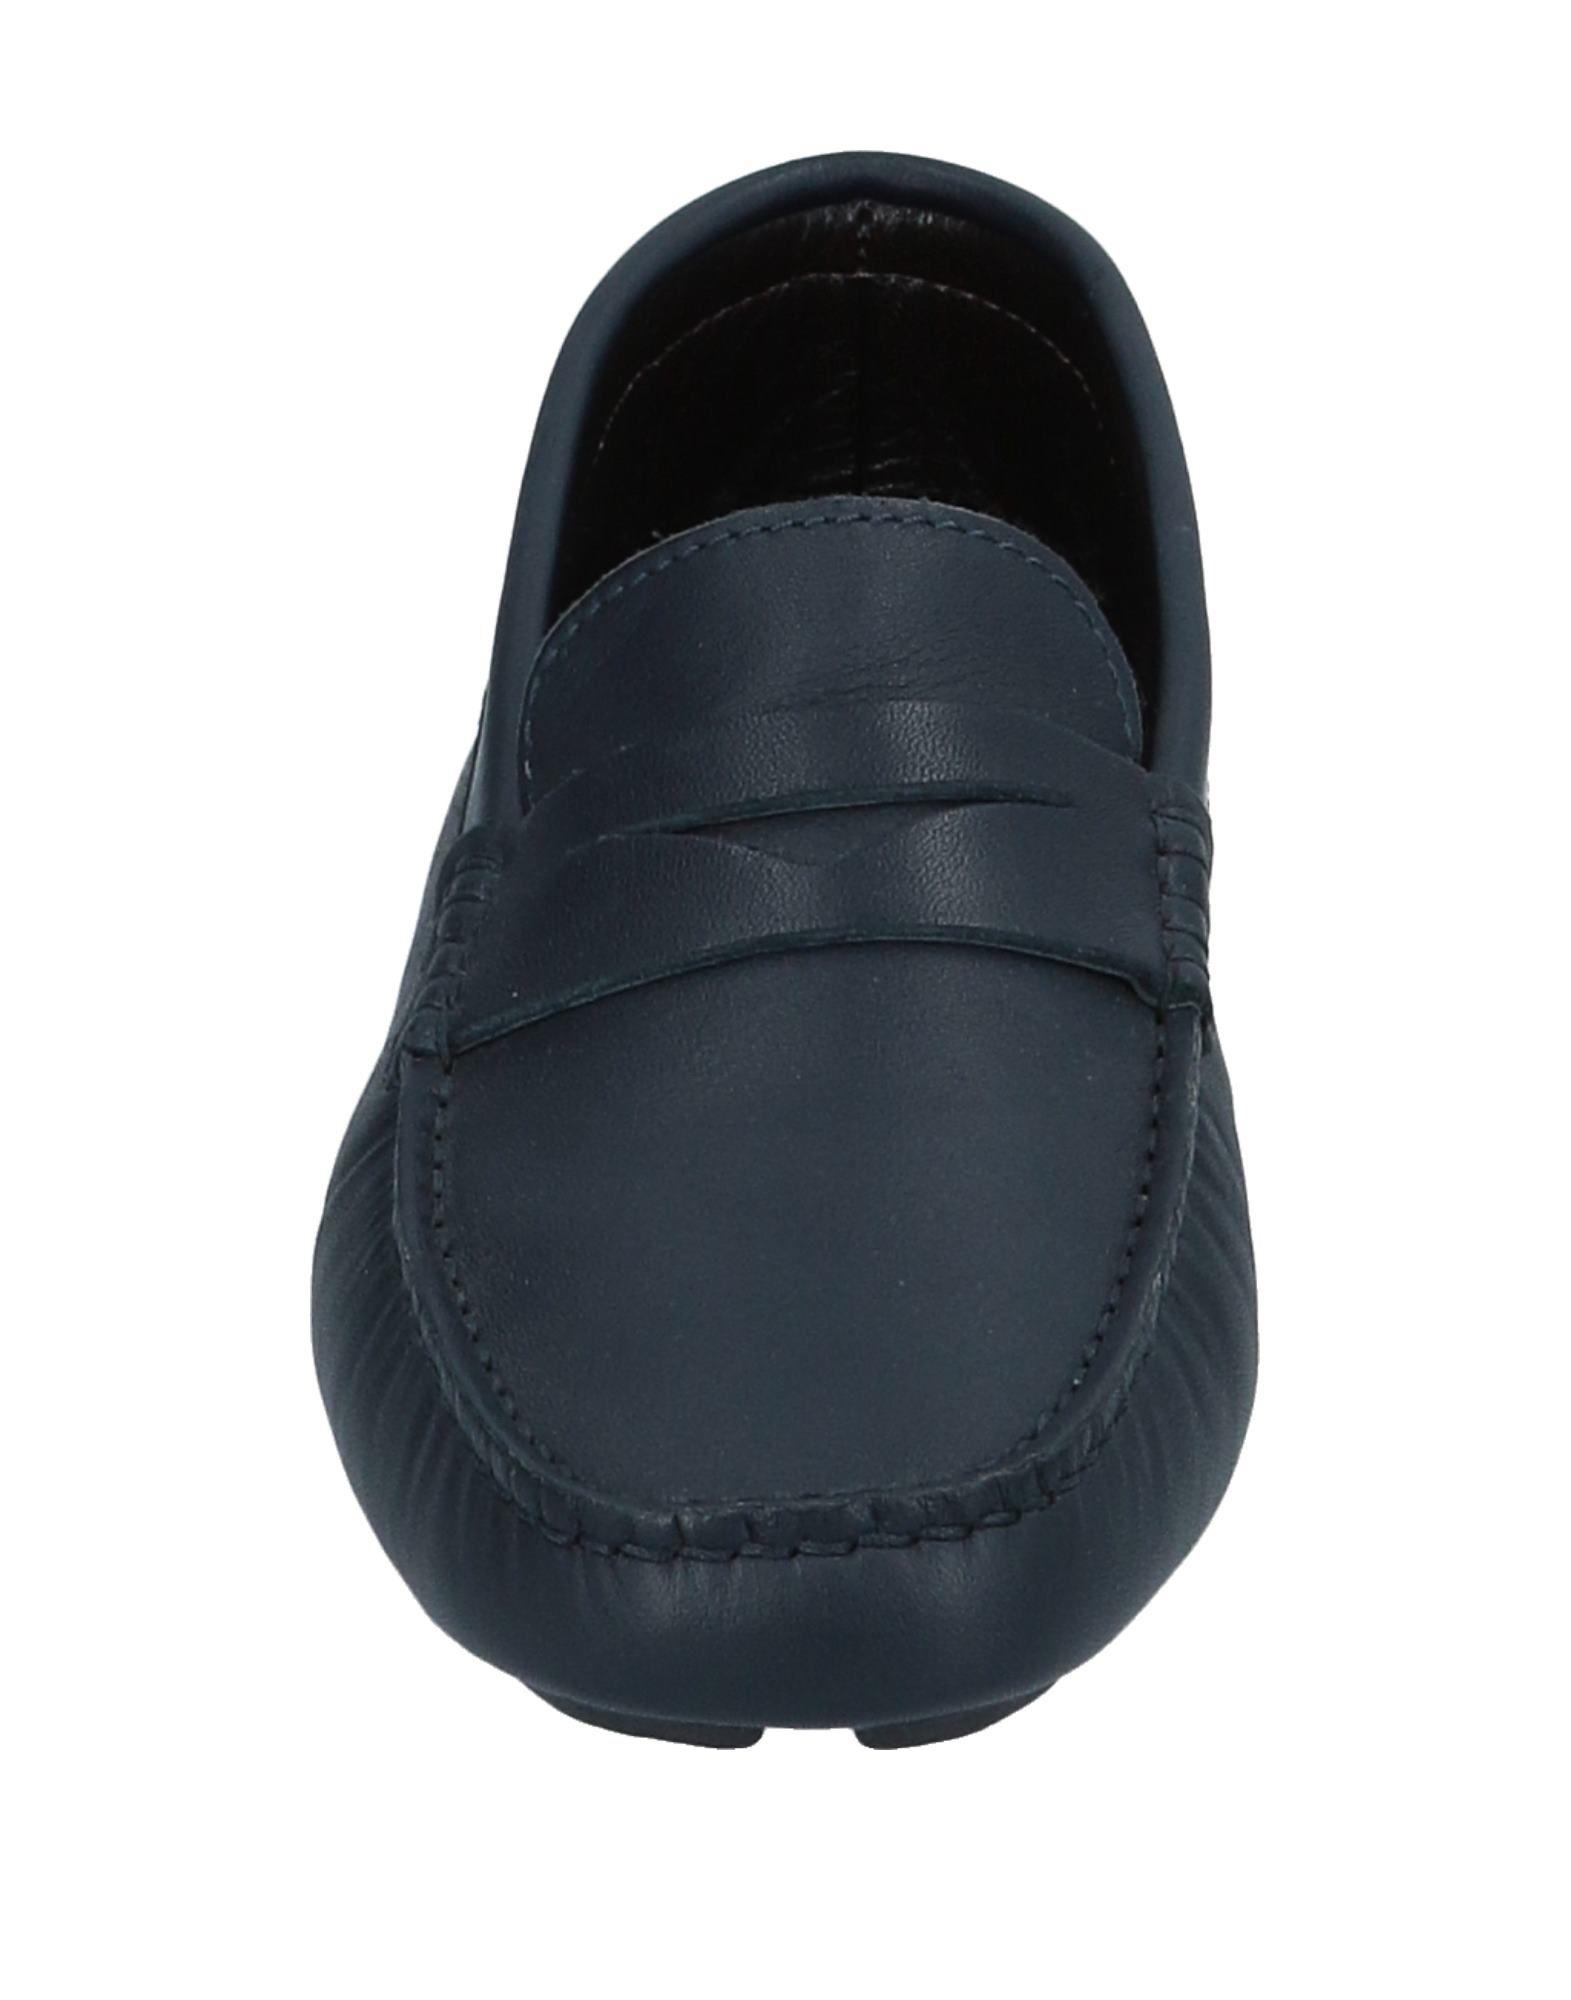 A.Testoni 11542418VQ Mokassins Herren  11542418VQ A.Testoni Gute Qualität beliebte Schuhe 60db67